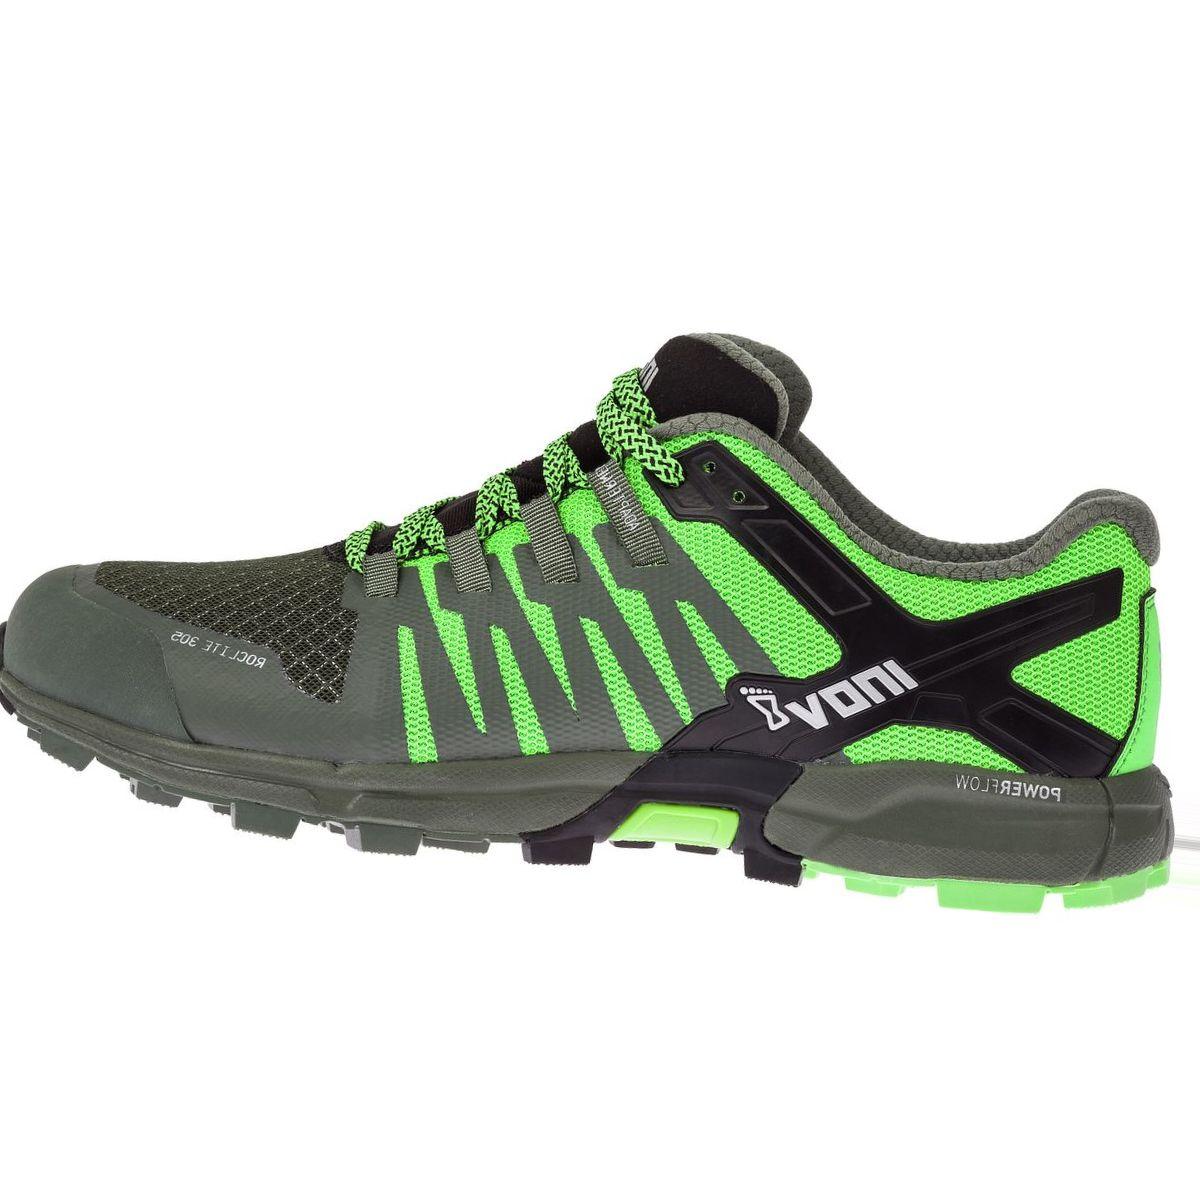 Inov 8 Roclite 305 Trail Running Shoe - Men's